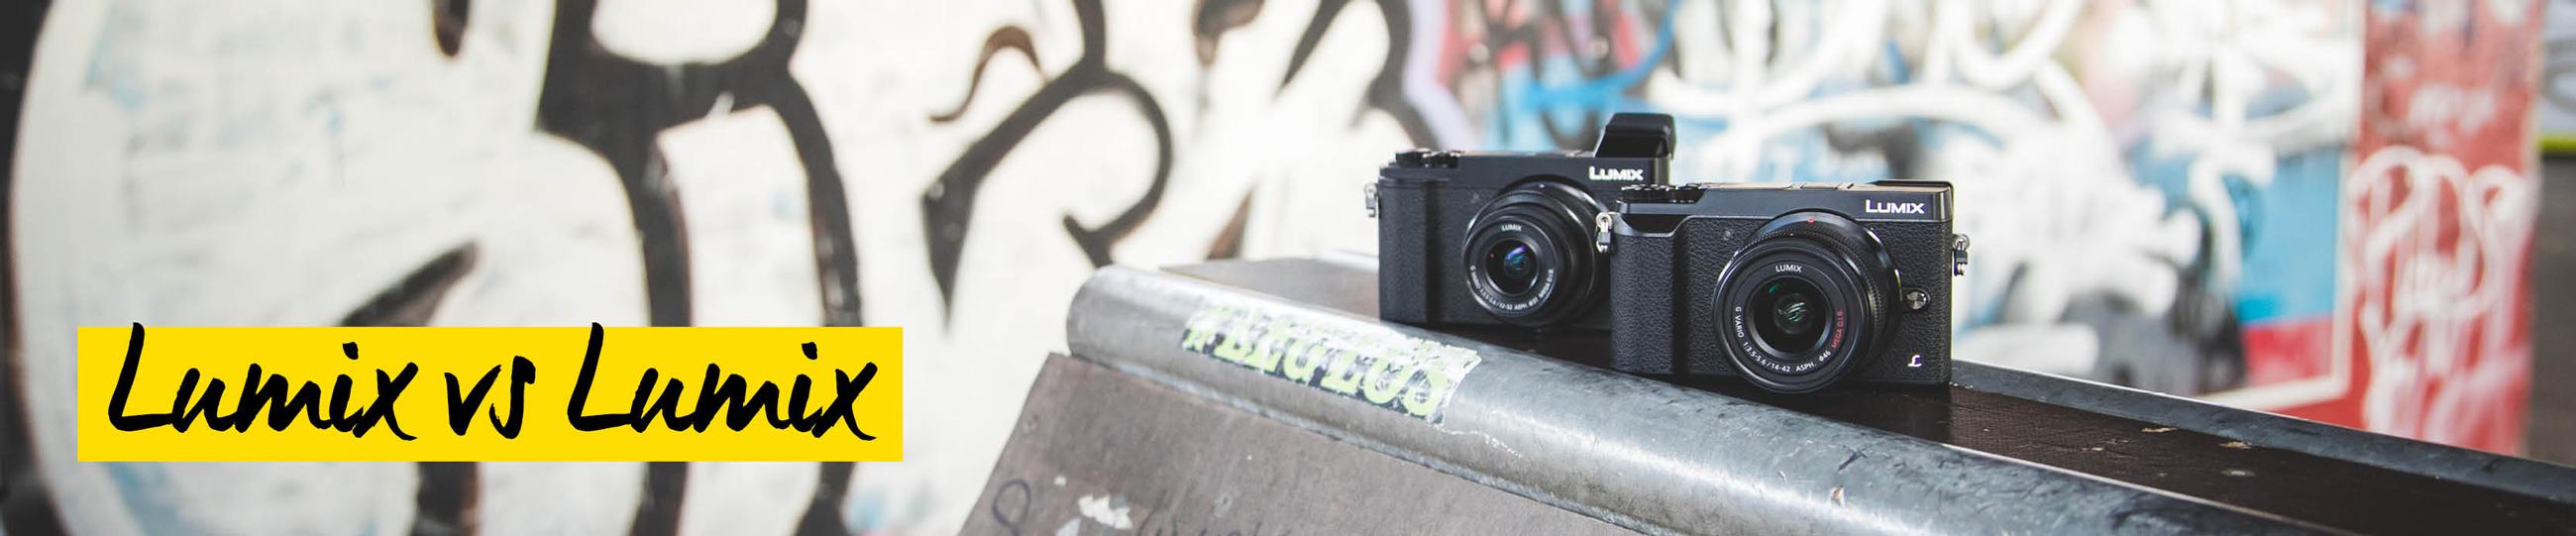 Panasonic Lumix Systemkamera Vergleich